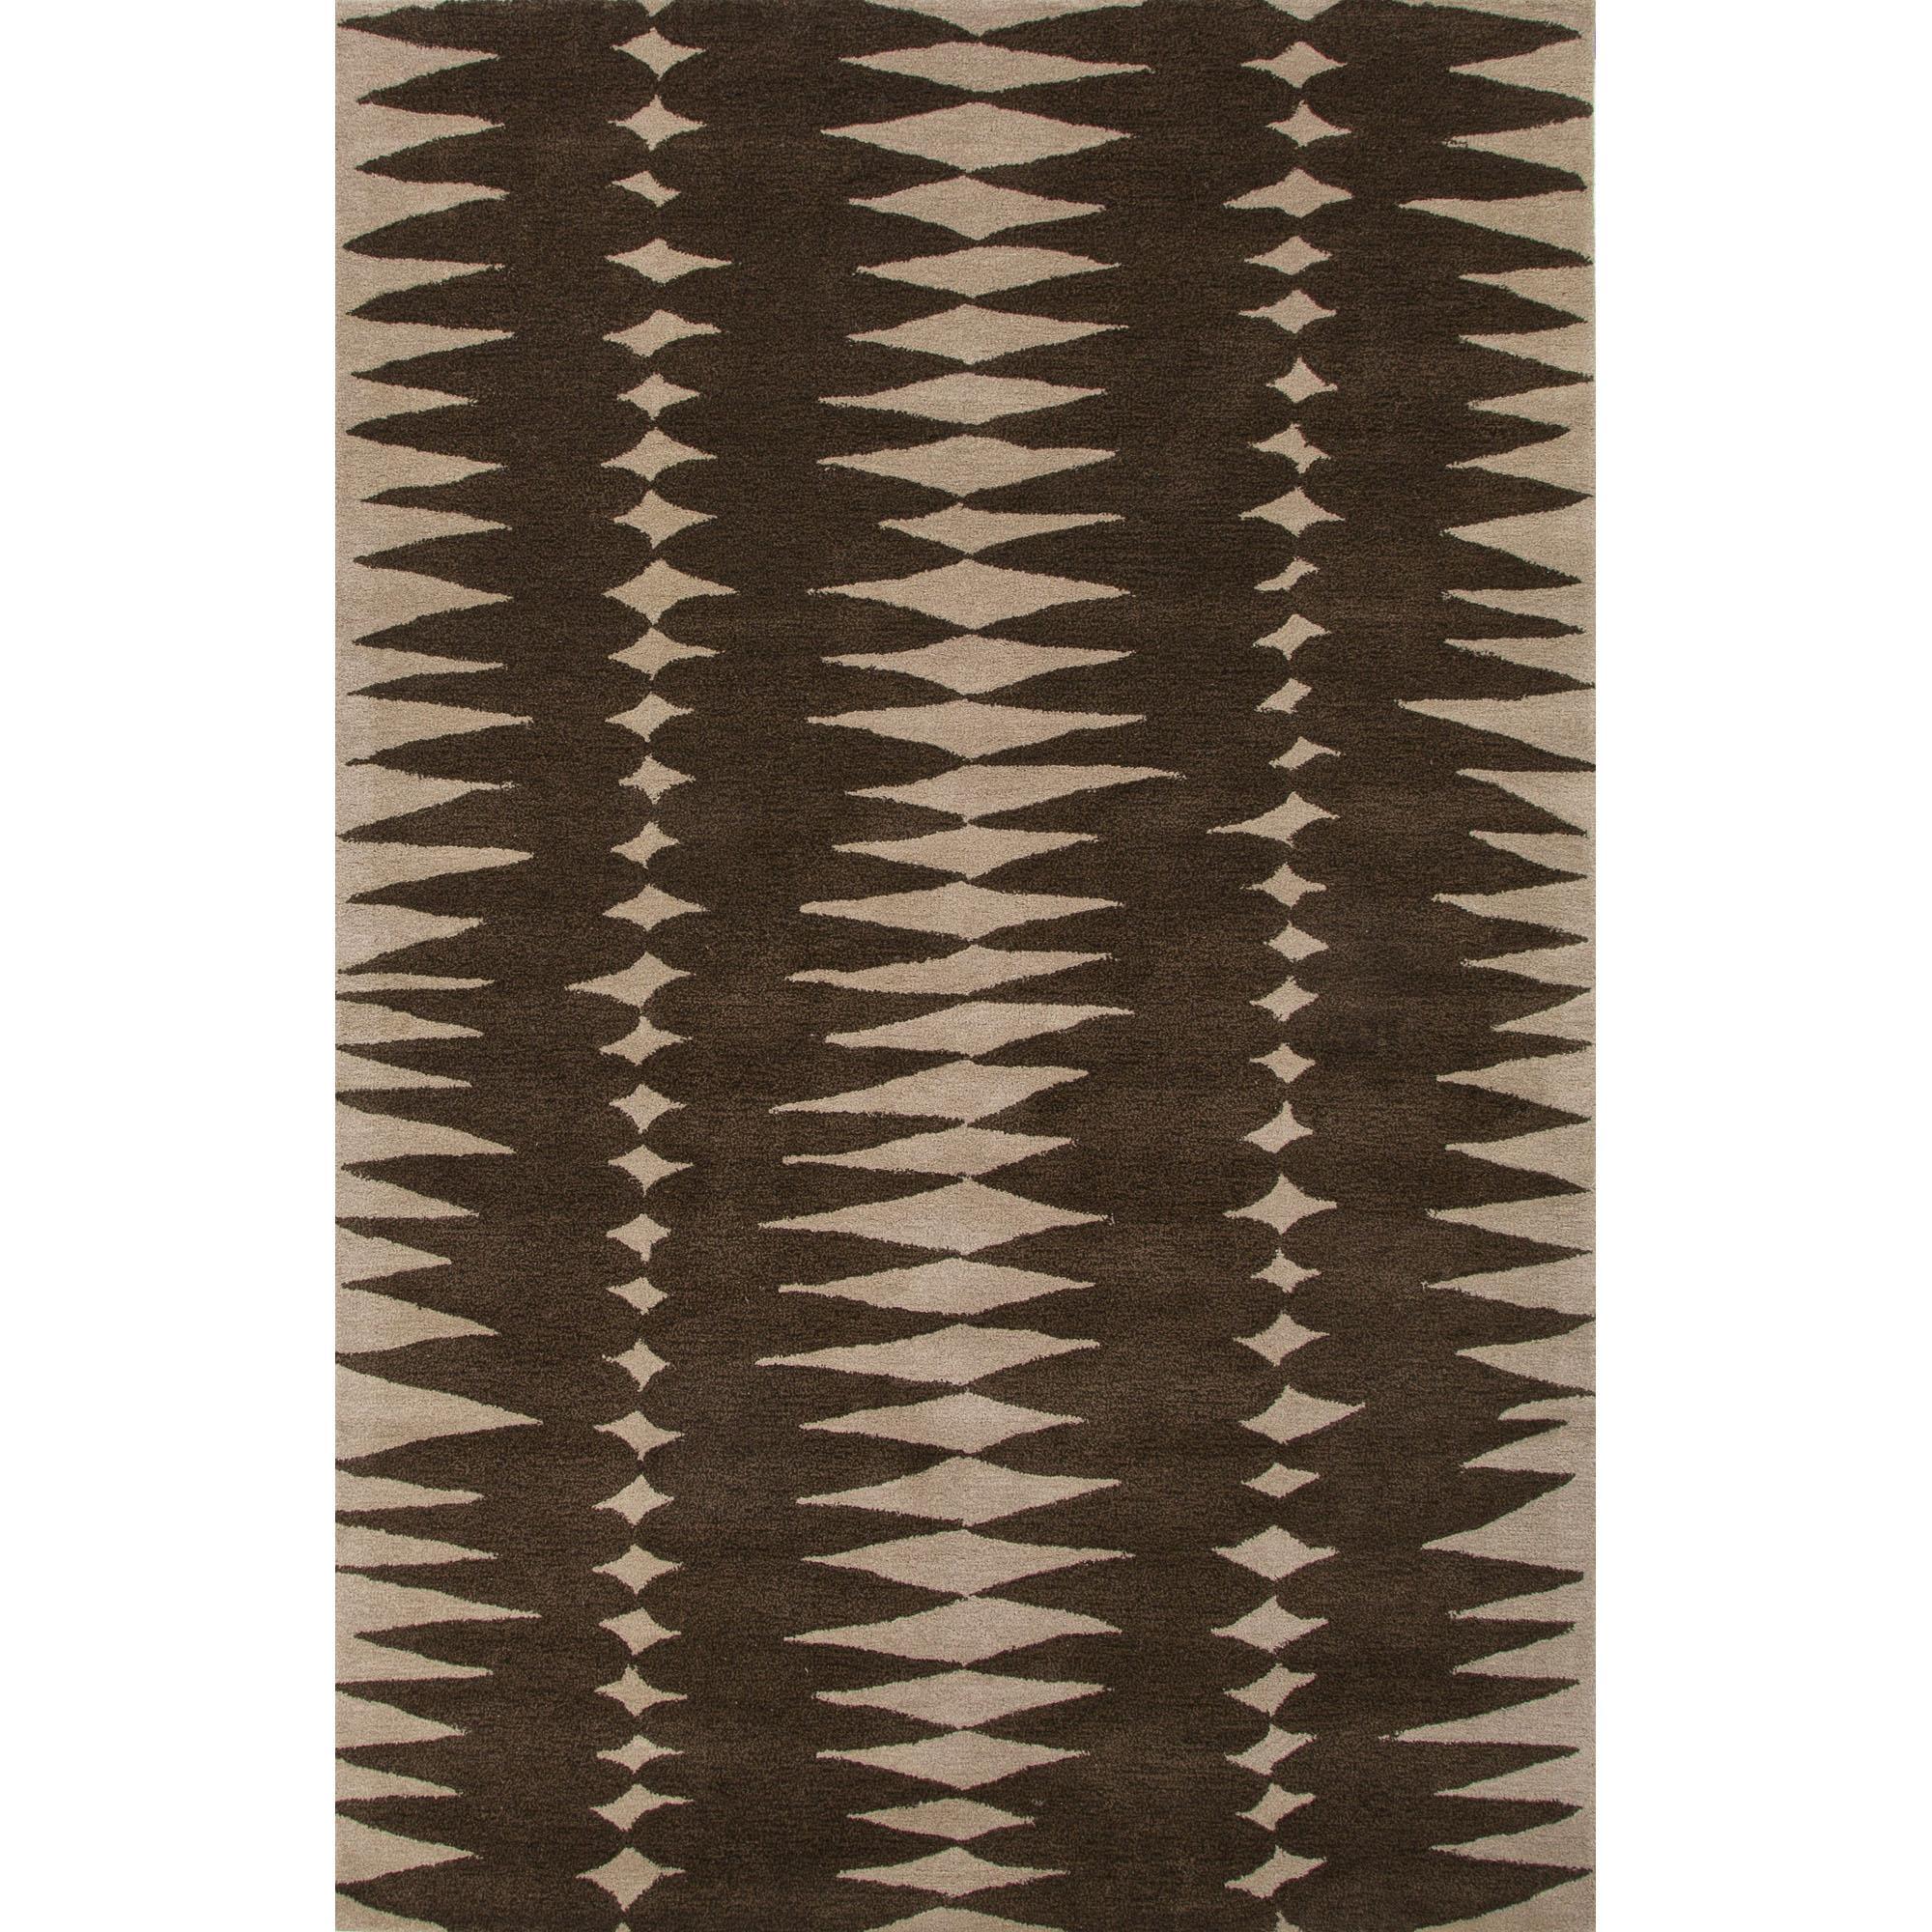 JAIPUR Rugs En Casa By Luli Sanchez Tufted 5 x 8 Rug - Item Number: RUG115840